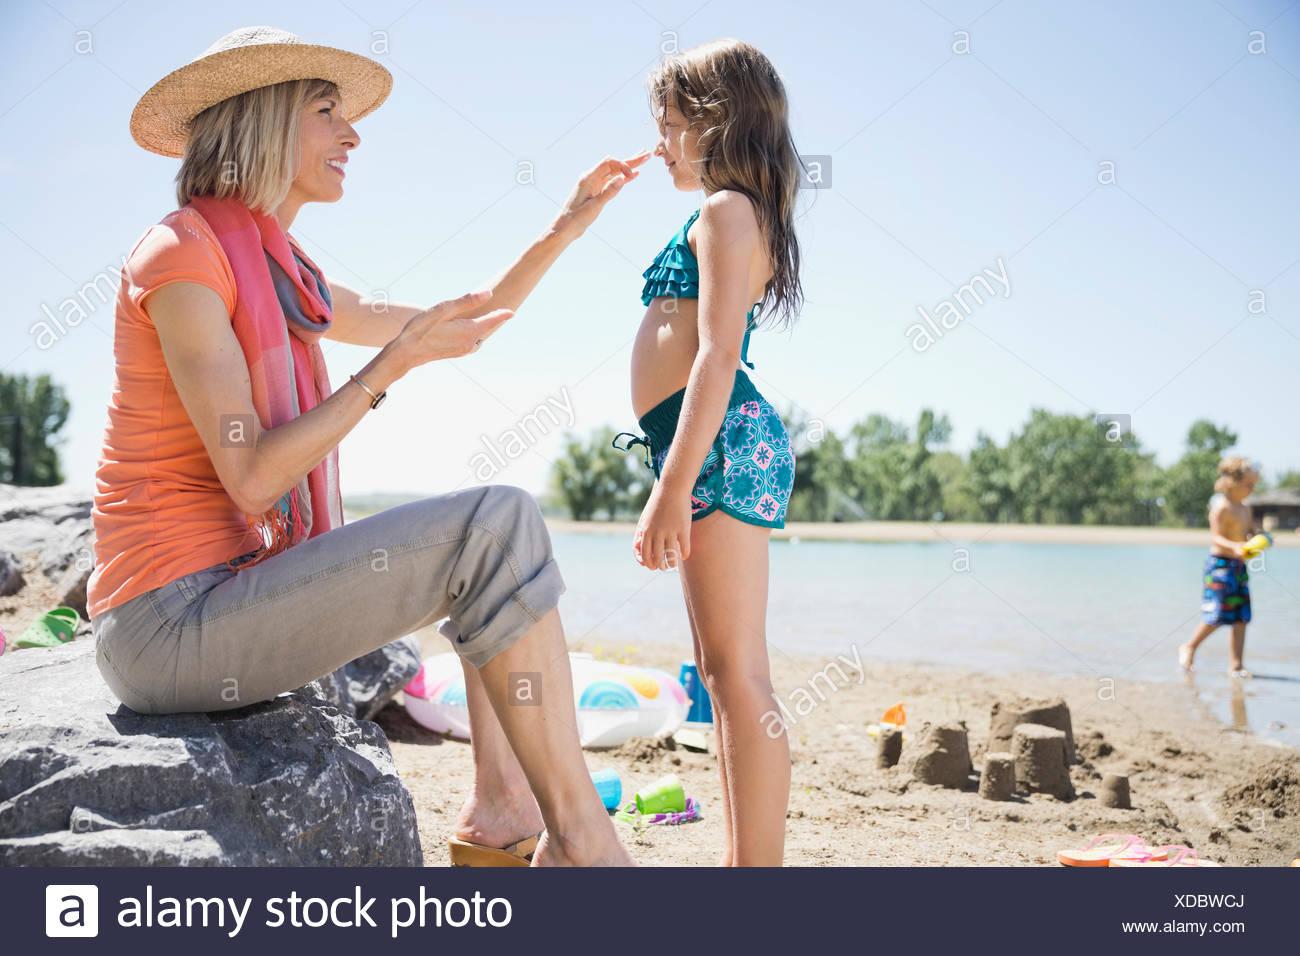 Grandmother applying sunscreen to granddaughter - Stock Image